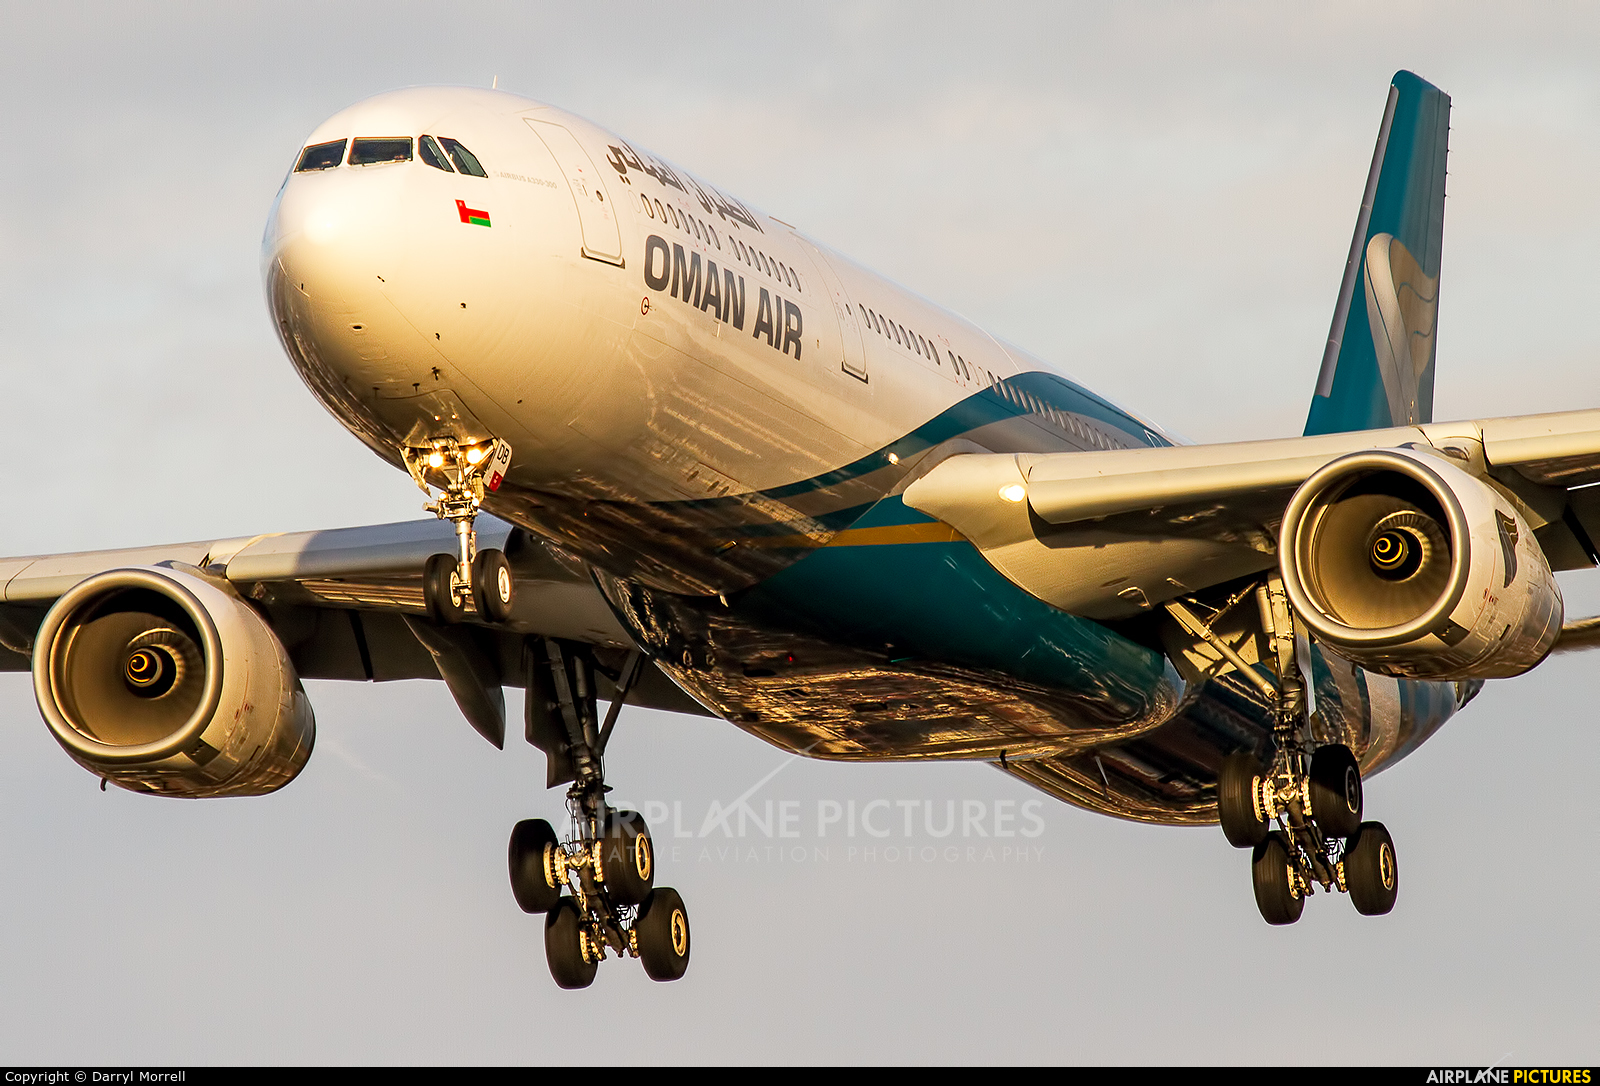 Oman Air A4O-DB aircraft at London - Heathrow